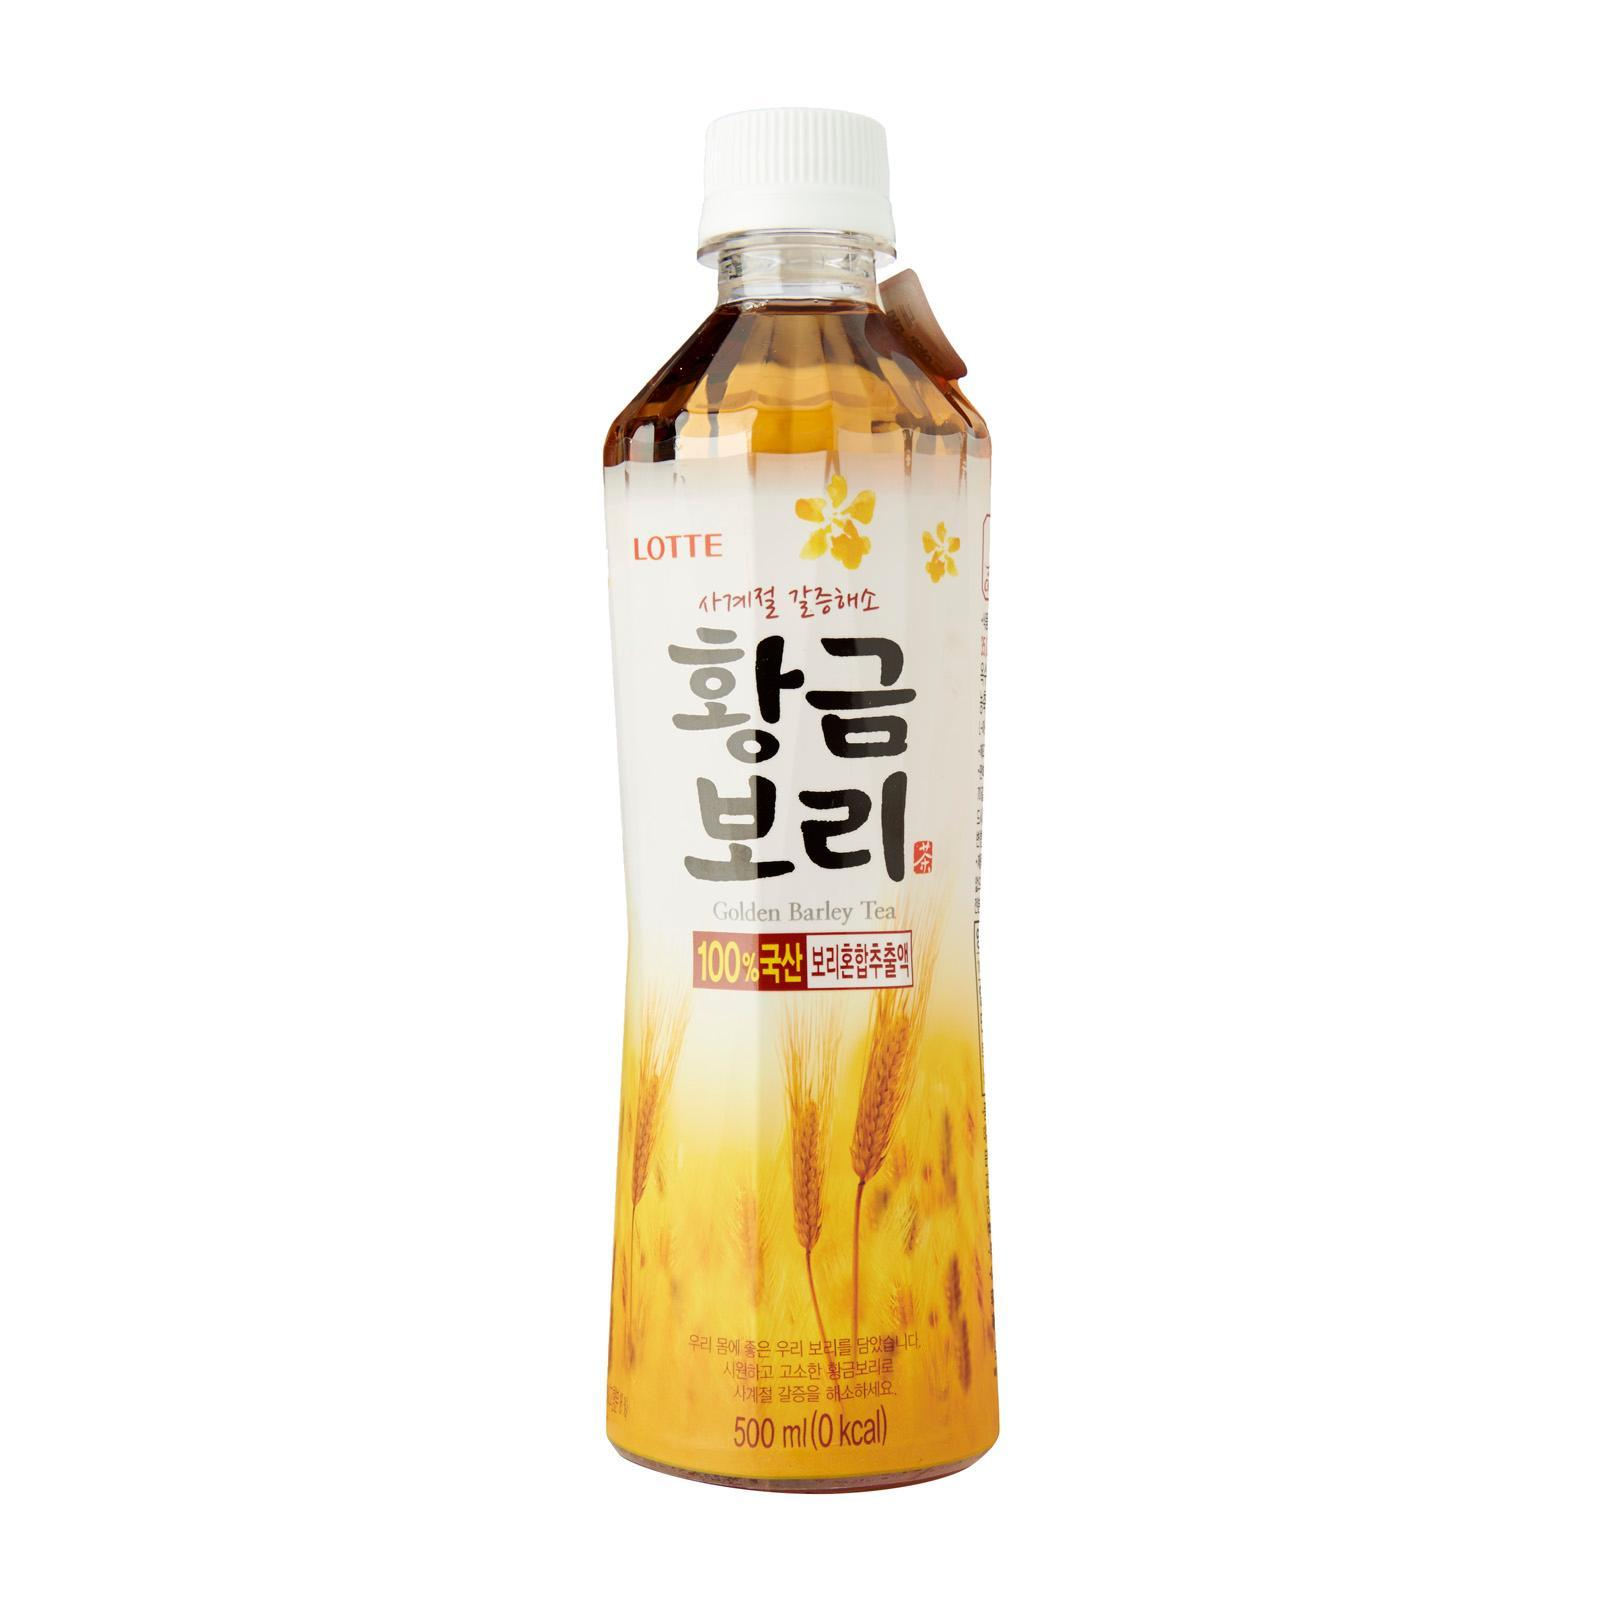 Lotte Chilsung Golden Barley Tea